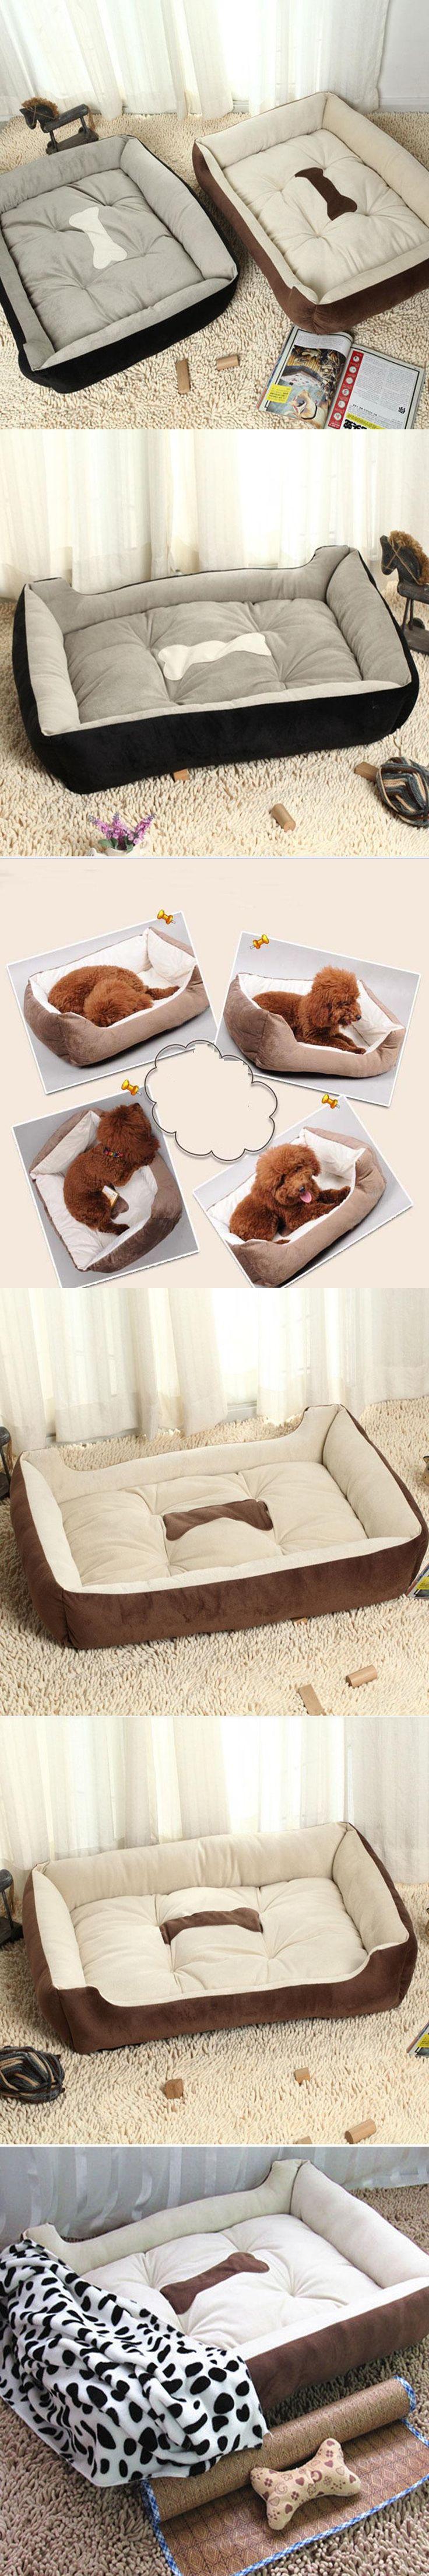 2016 New PLUS Size Big Dog Bed Kennel Mat Soft Fleece Pet Dog Puppy Warm Bed House Plush Cozy Nest Dog House Pad Warm Pet House